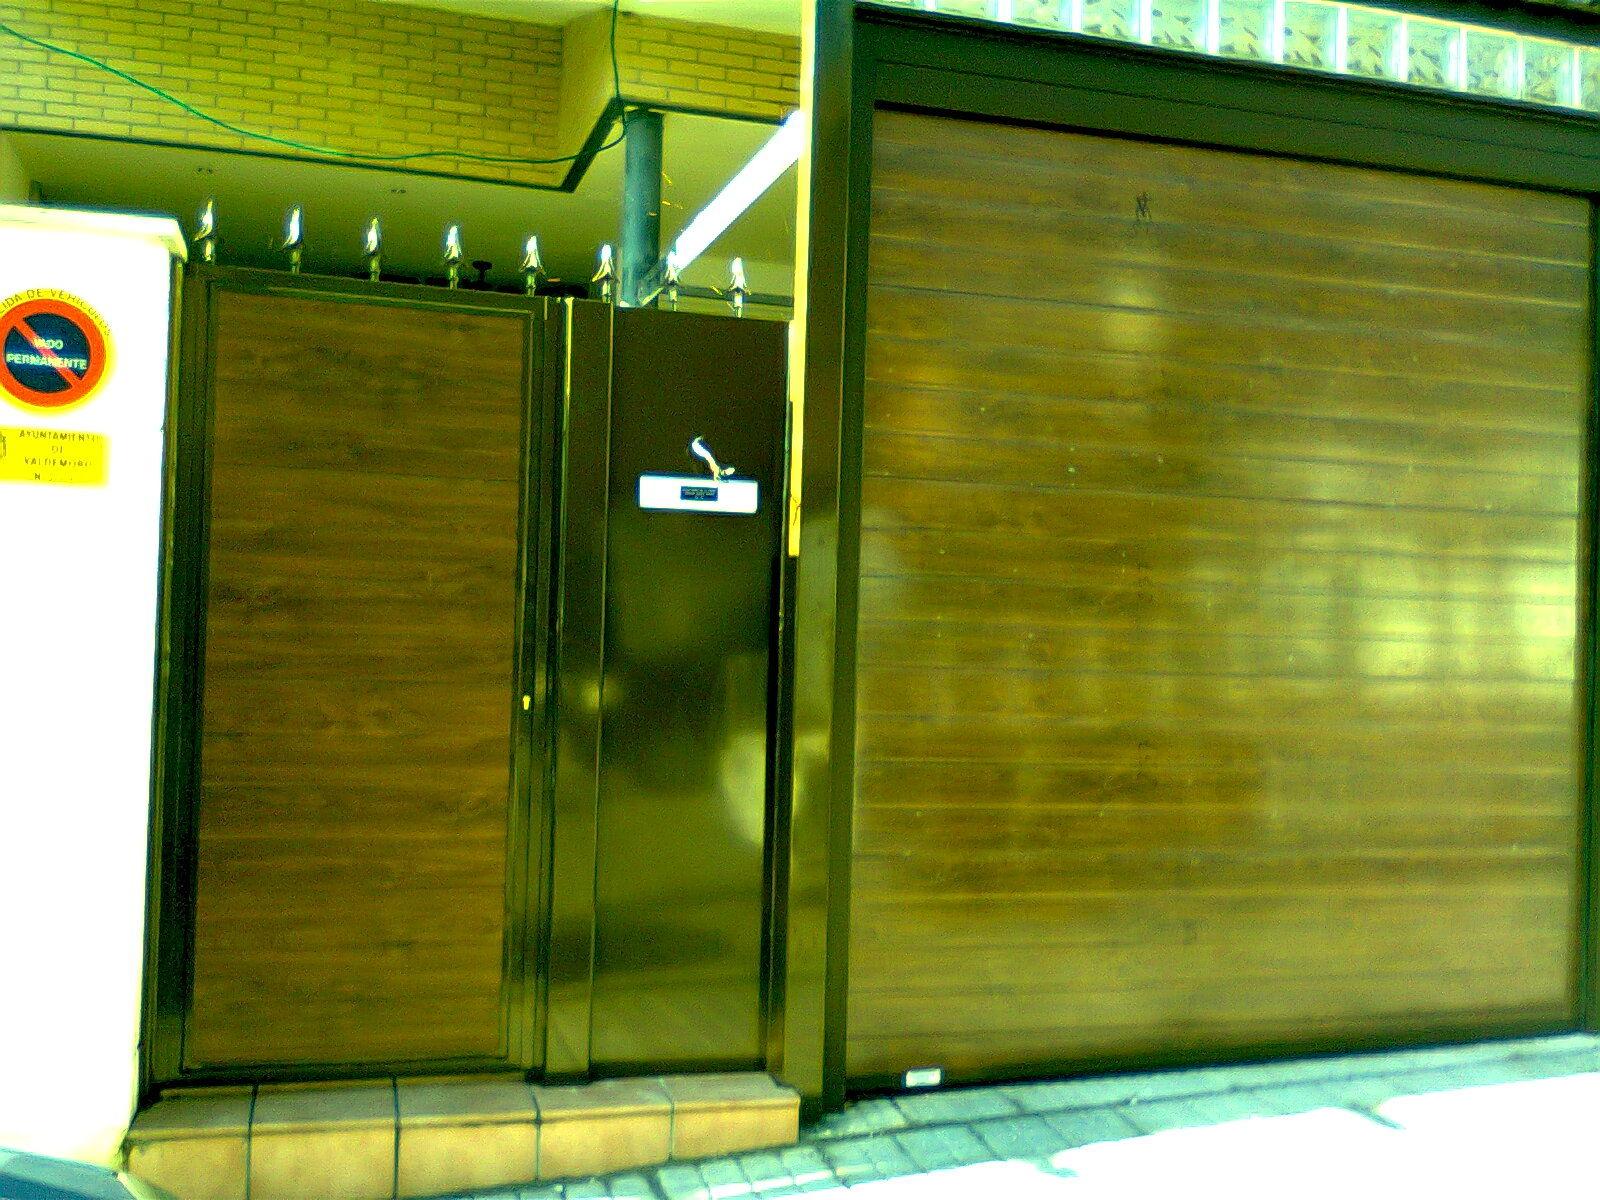 Puerta seccional imitacion madera con puerta peatonal panelada